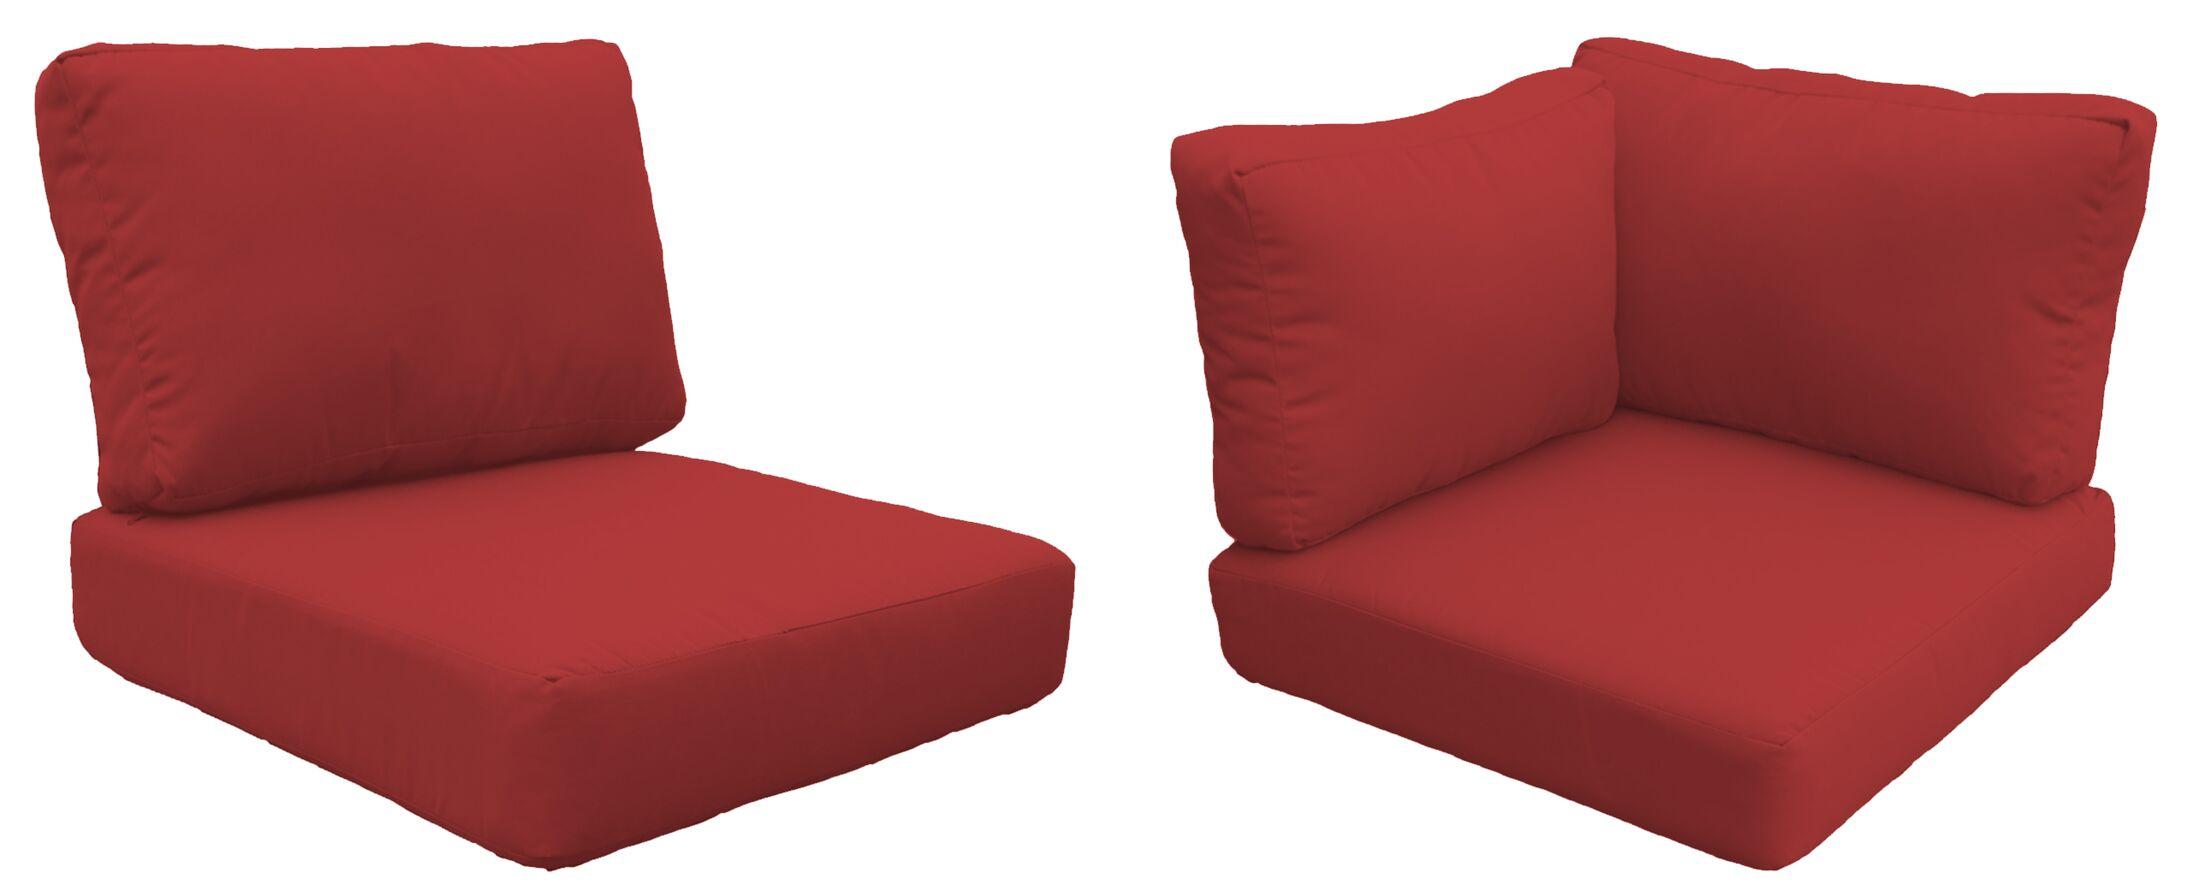 Fairmont 17 Piece Outdoor�Lounge Chair Cushion Set Fabric: Terracotta